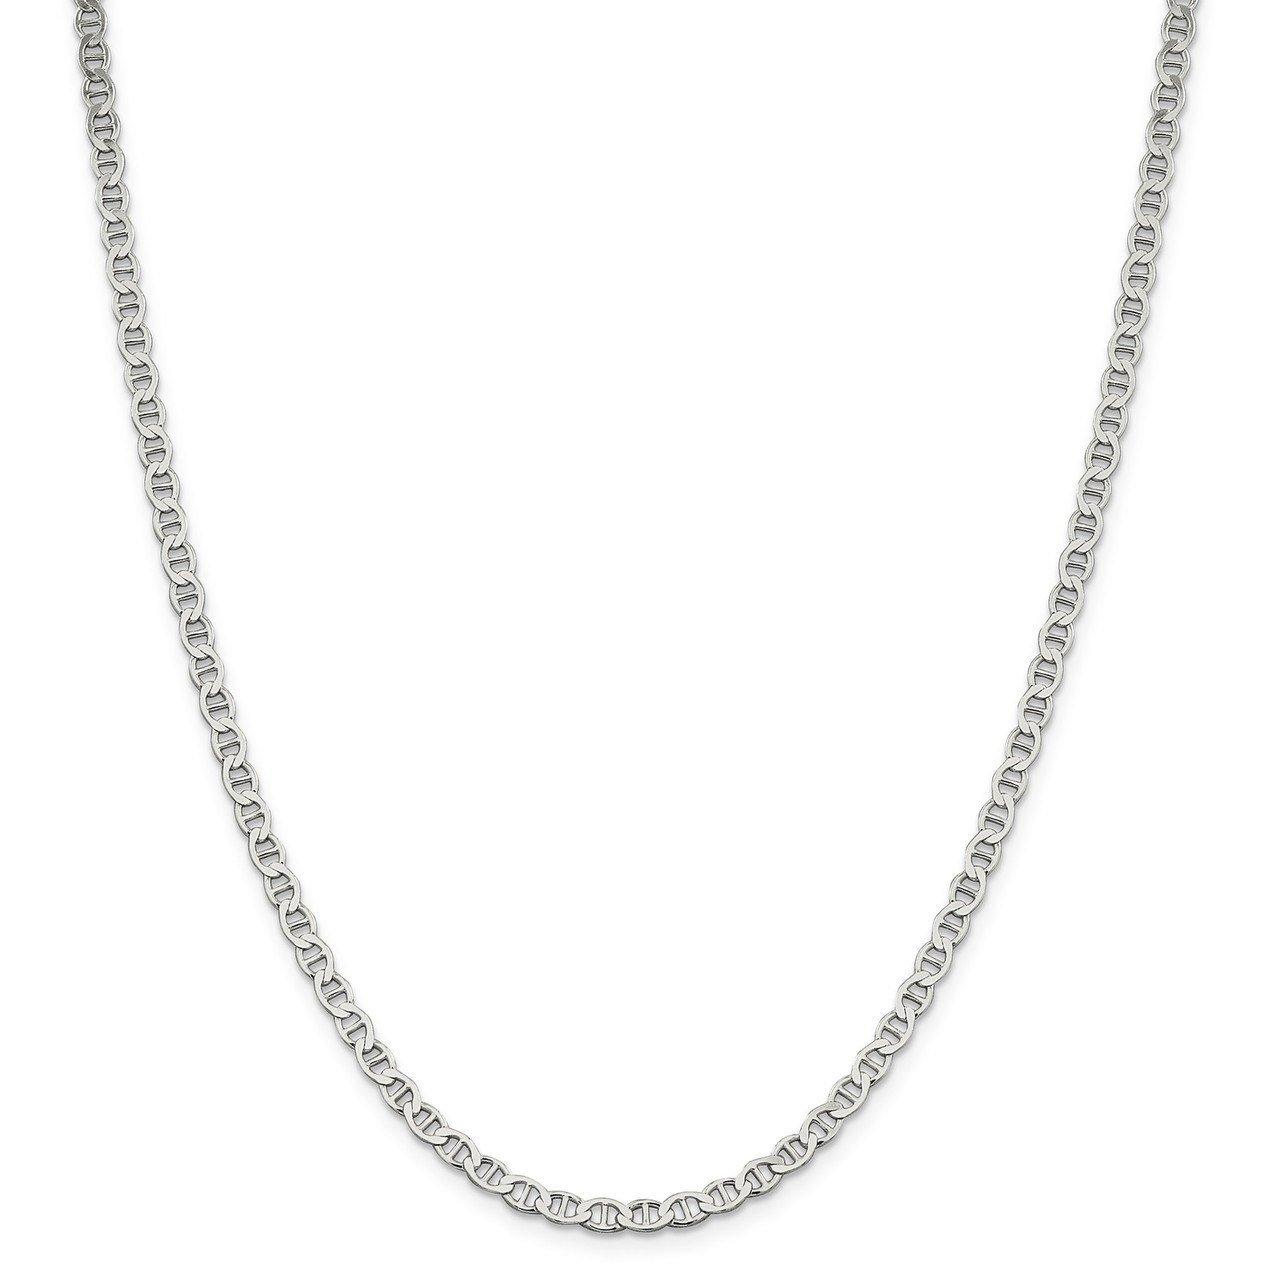 Lex & Lu Sterling Silver 4mm Flat Anchor Chain Anklet, Bracelet or Necklace-Prime